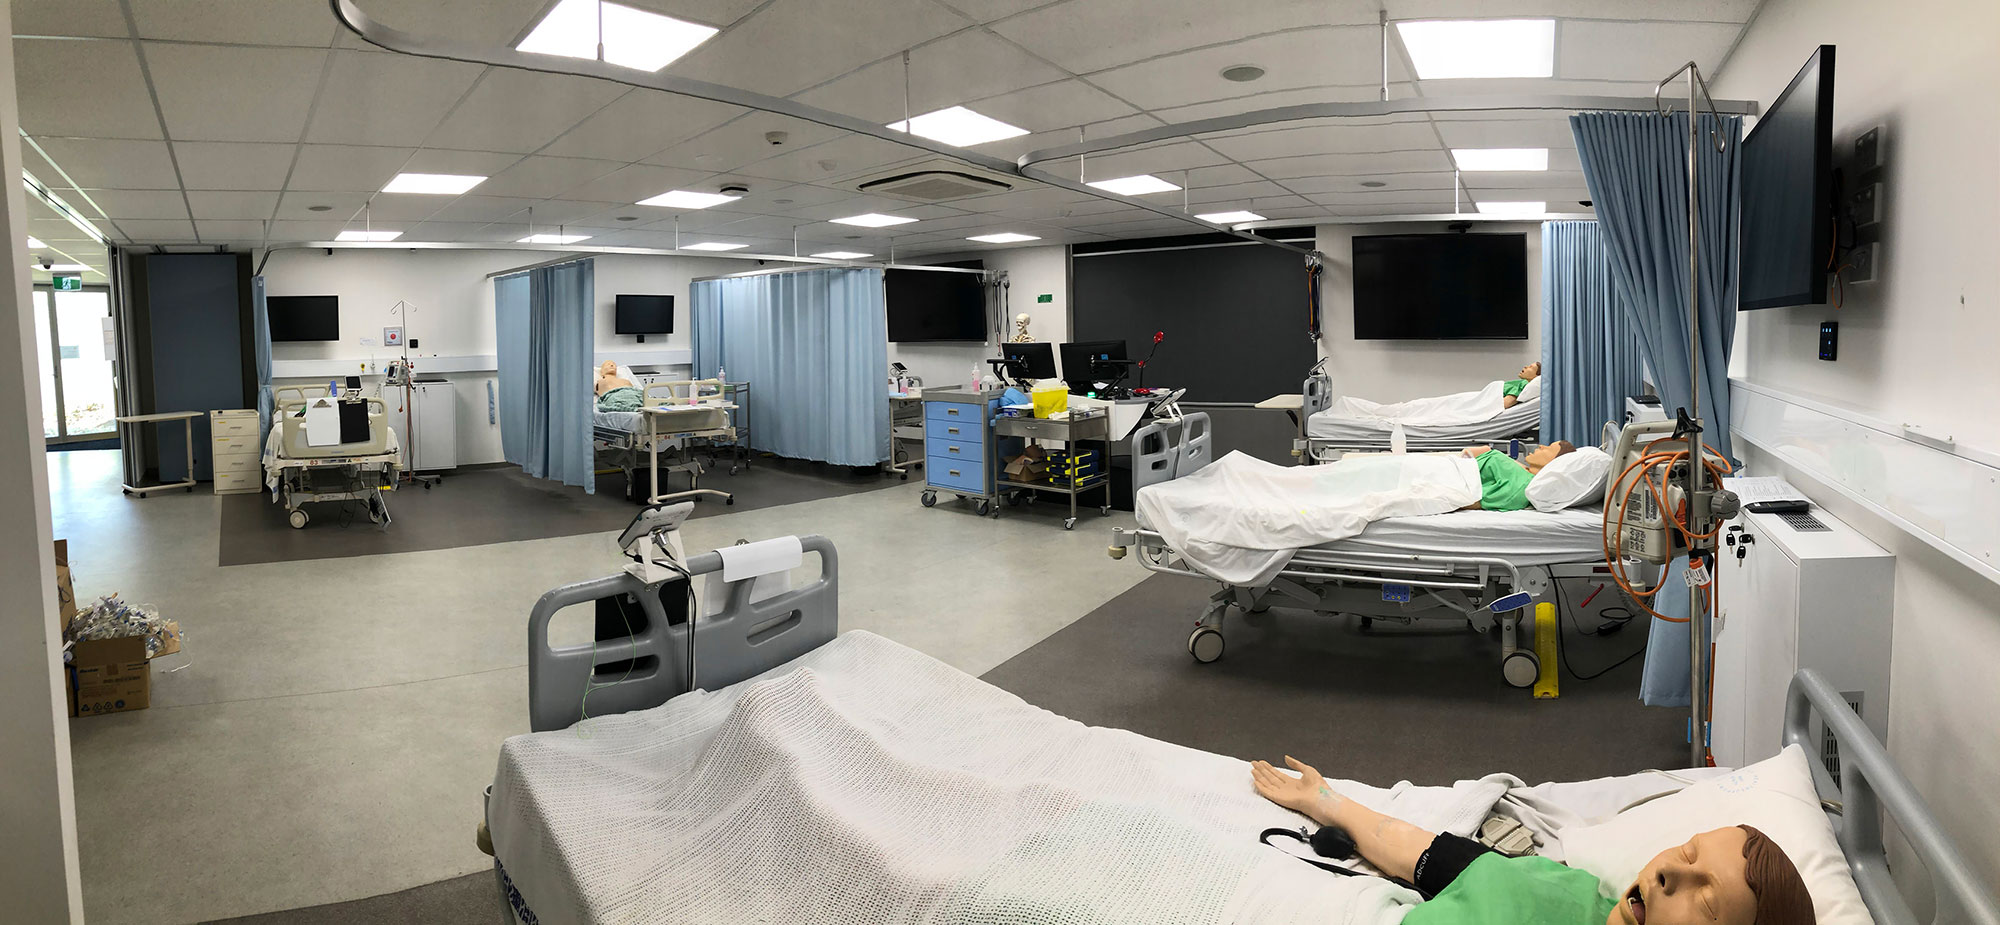 Inside Rozelle's nursing laboratory.